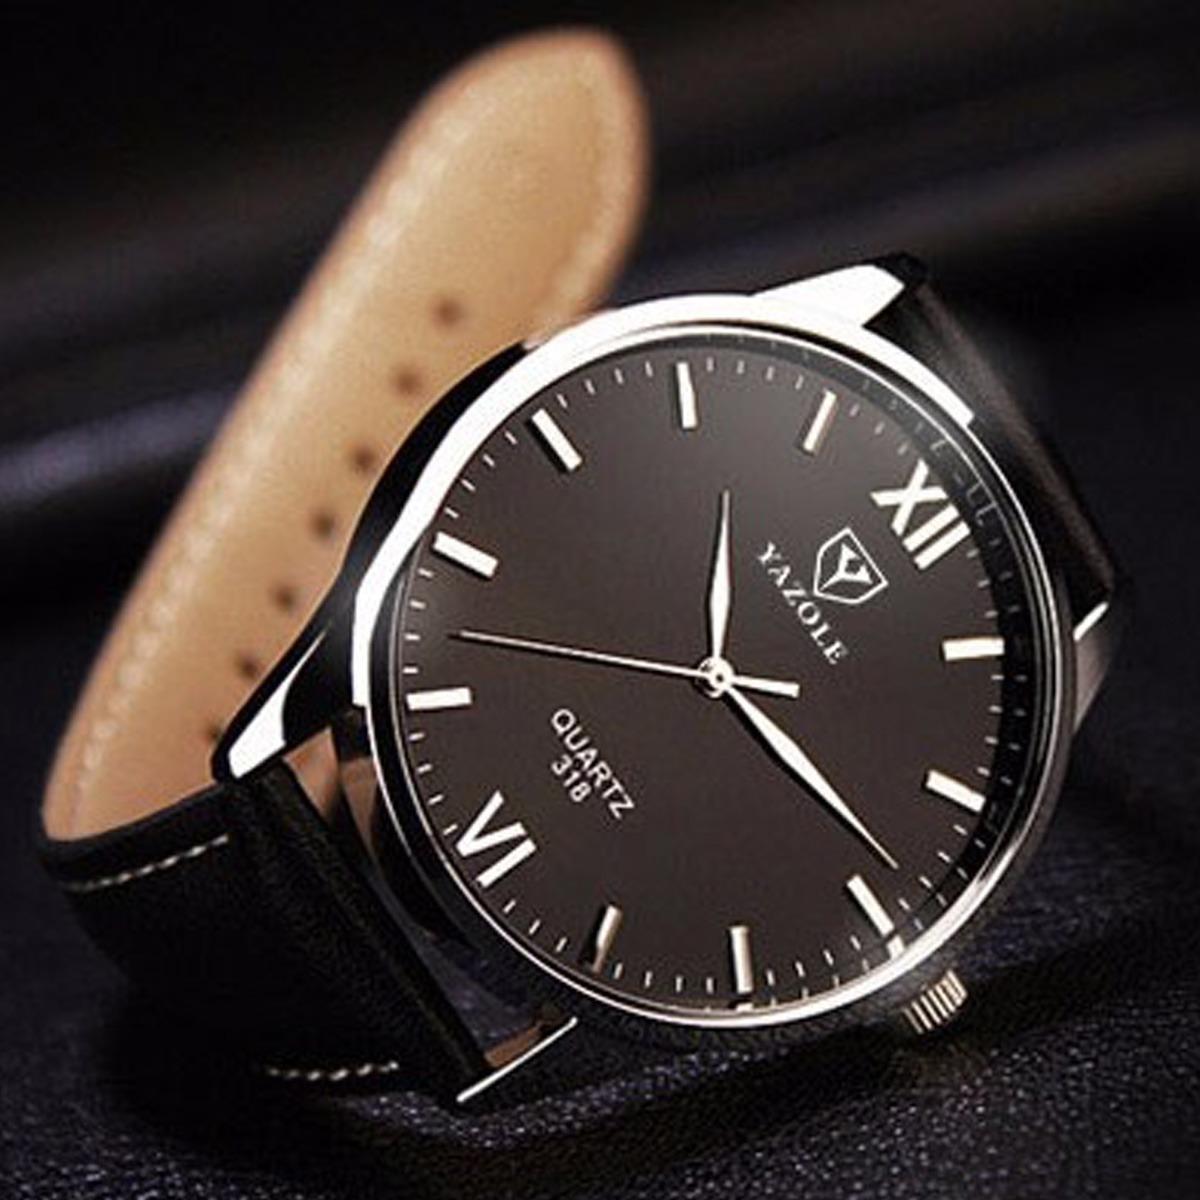 1cec4f9fa85 relógios masculinos social pulso yazole couro luxo barato n2. Carregando  zoom.